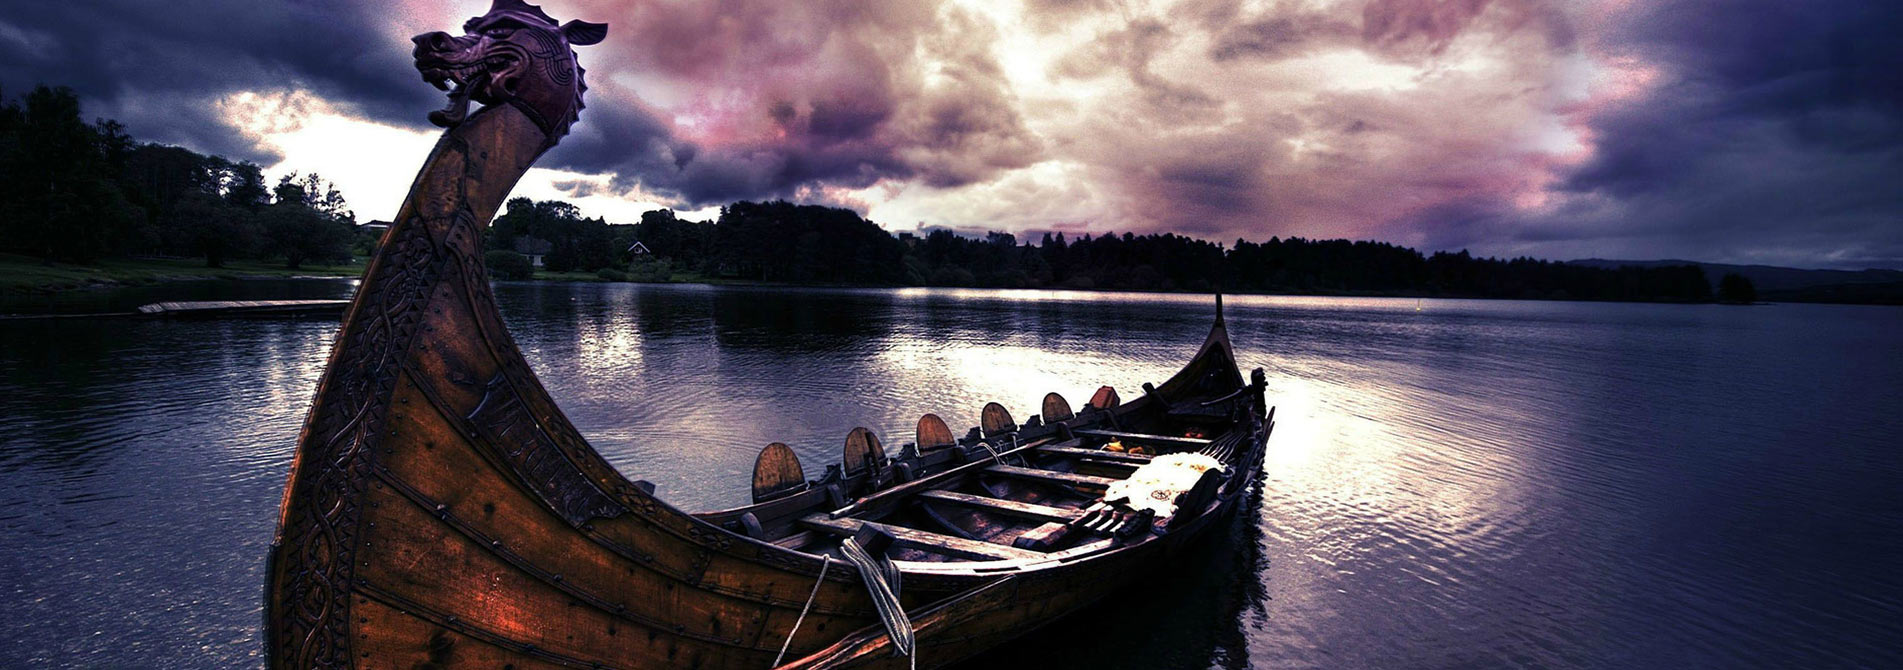 viking-boat